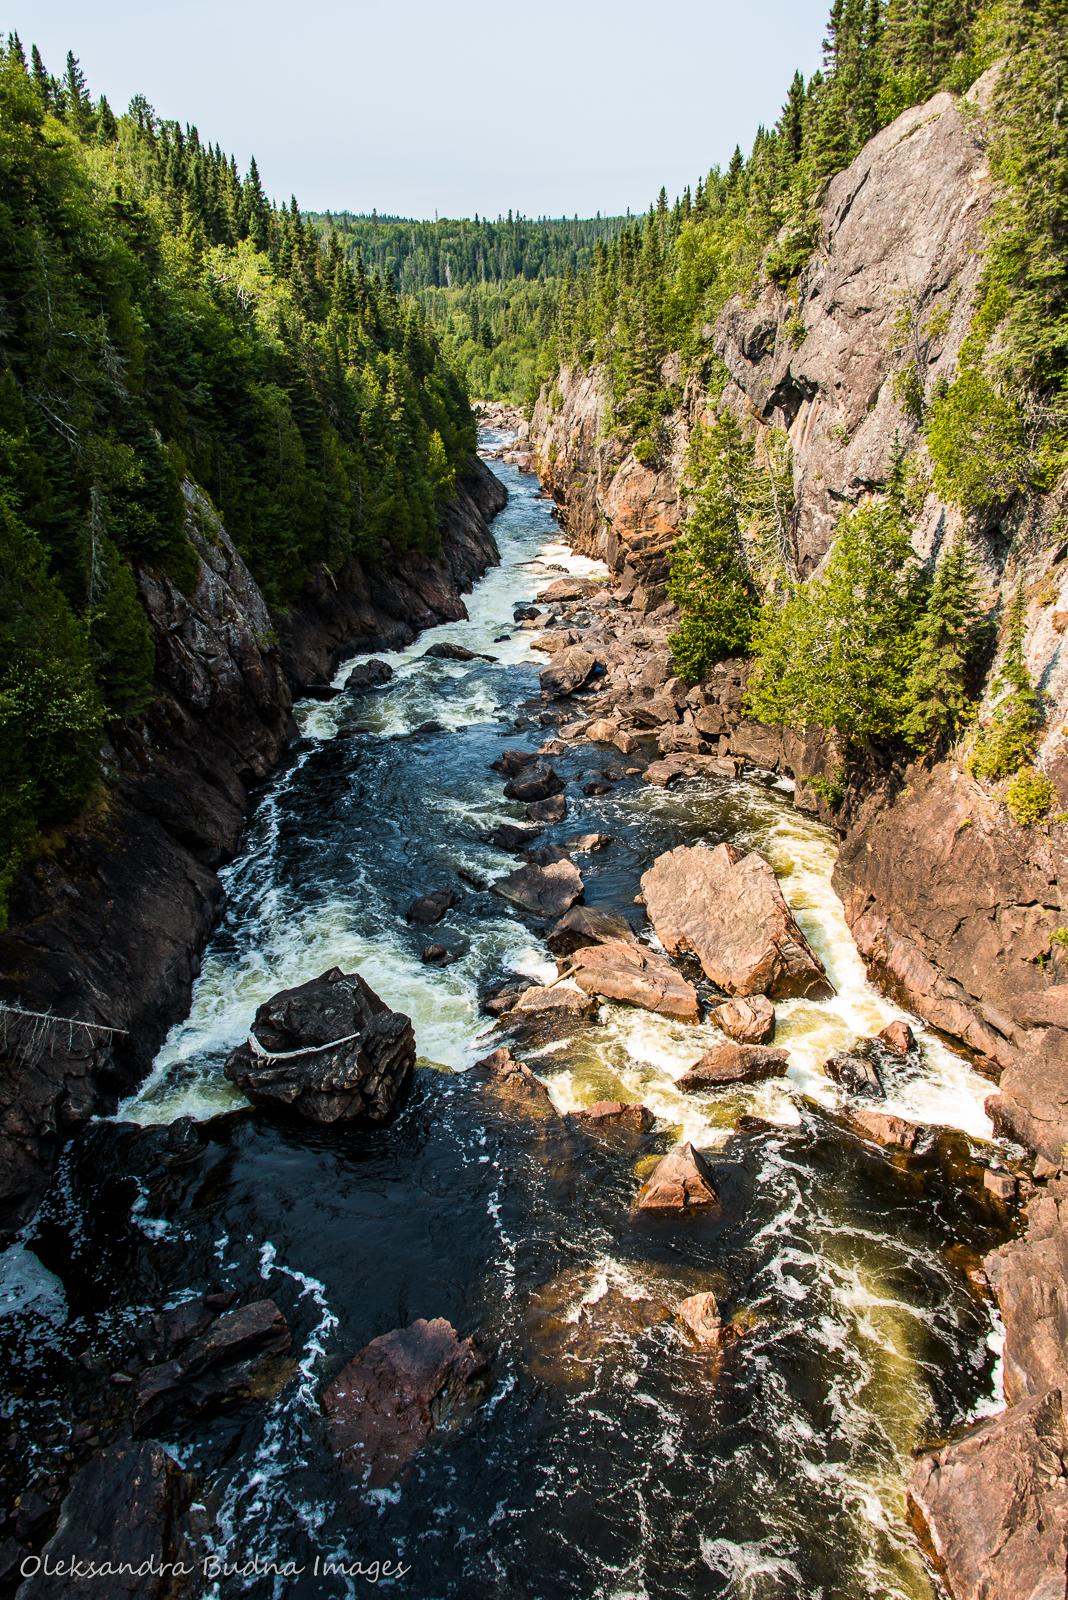 Chigaamiwinigum Falls in Pukaskwa